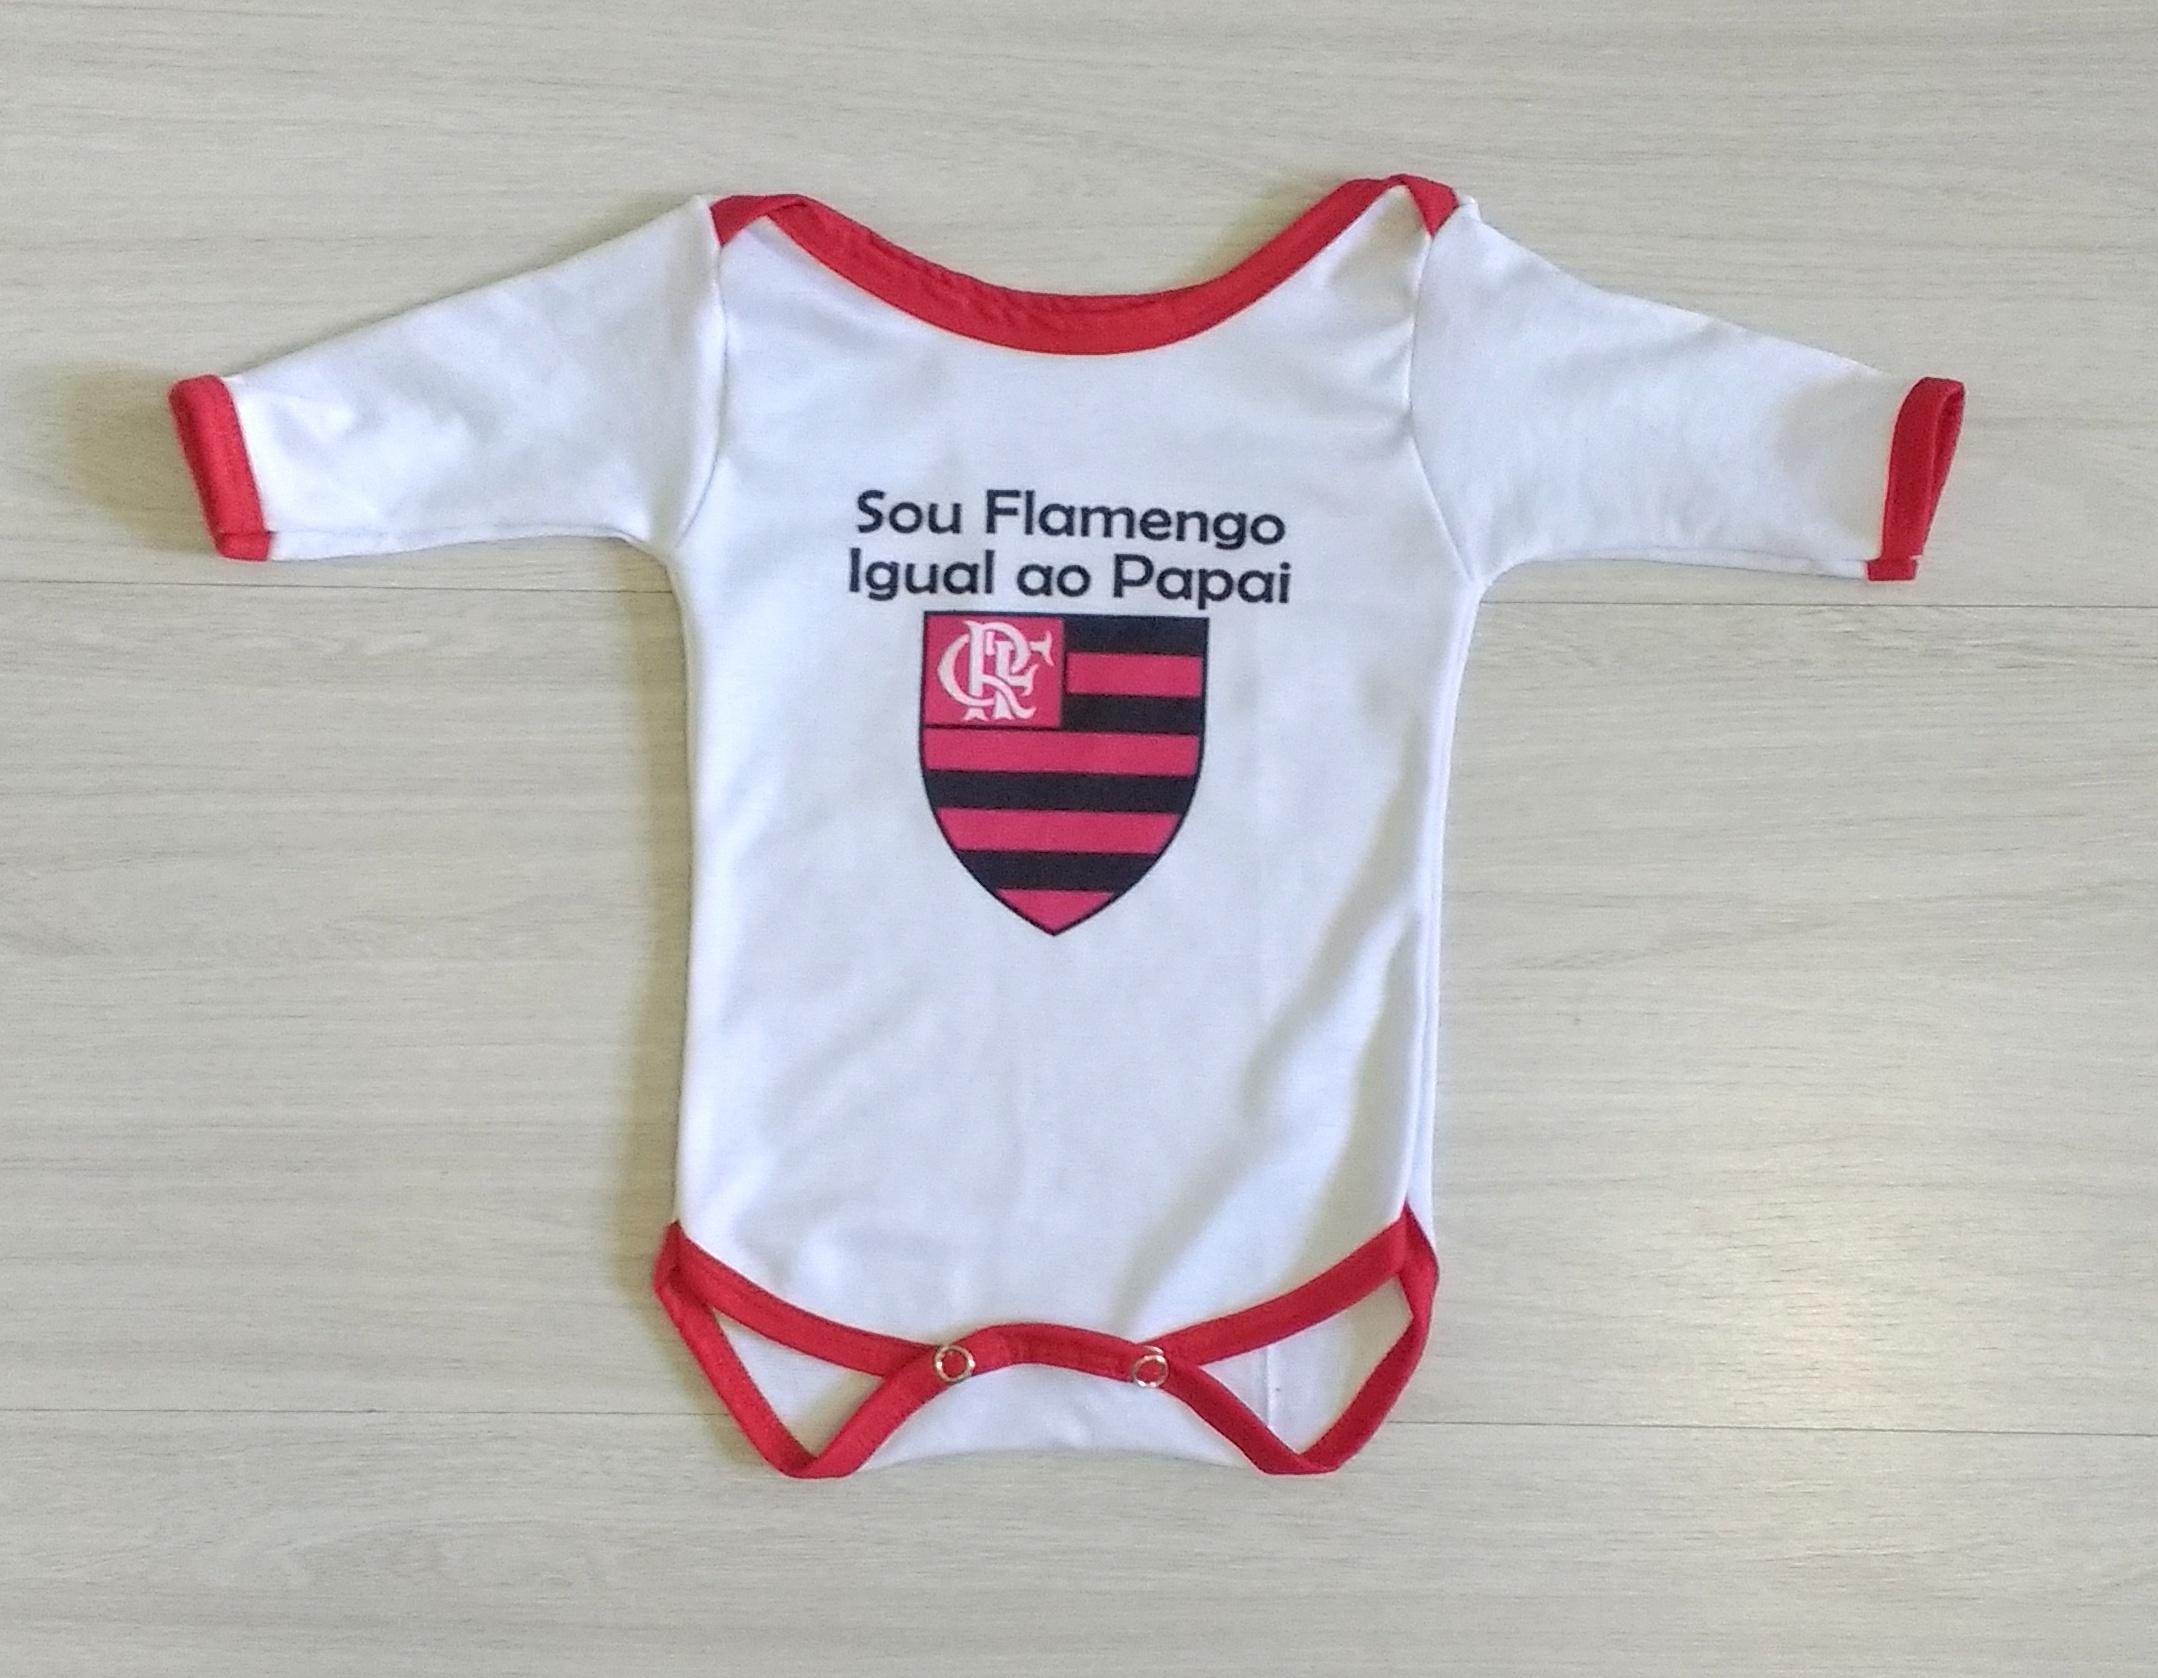 902c1d17f7f Body Flamengo Conjunto conjuntinho Personalizado fantasia no Elo7 | Estampa  do Seu Jeito (AA0C26)